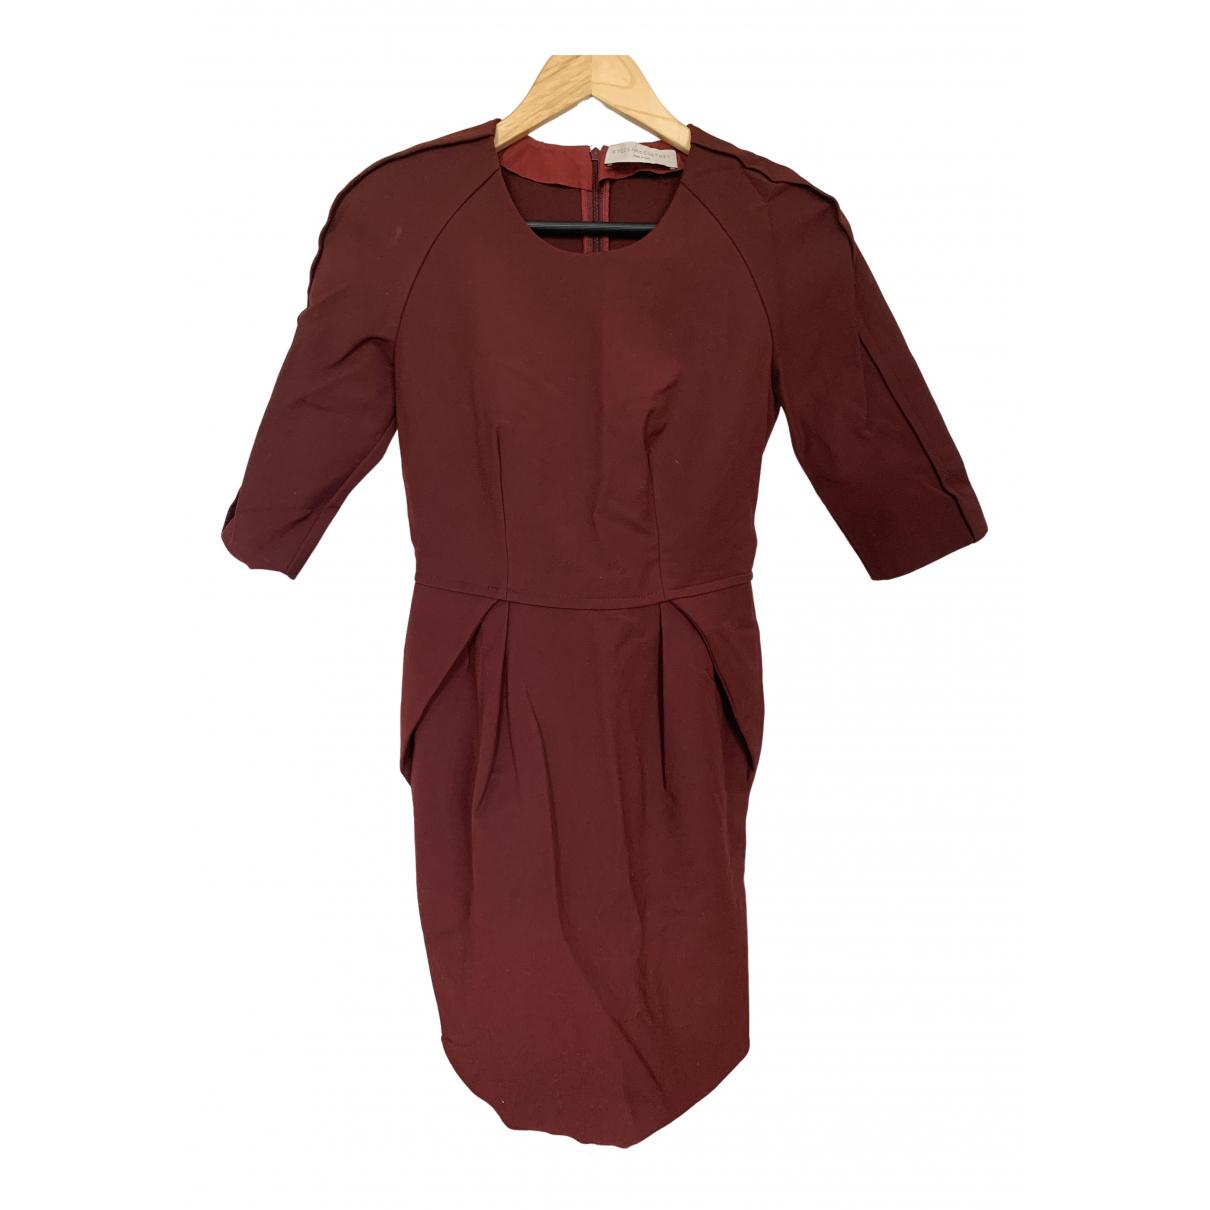 Stella Mccartney \N Burgundy Cotton - elasthane dress for Women 8 UK